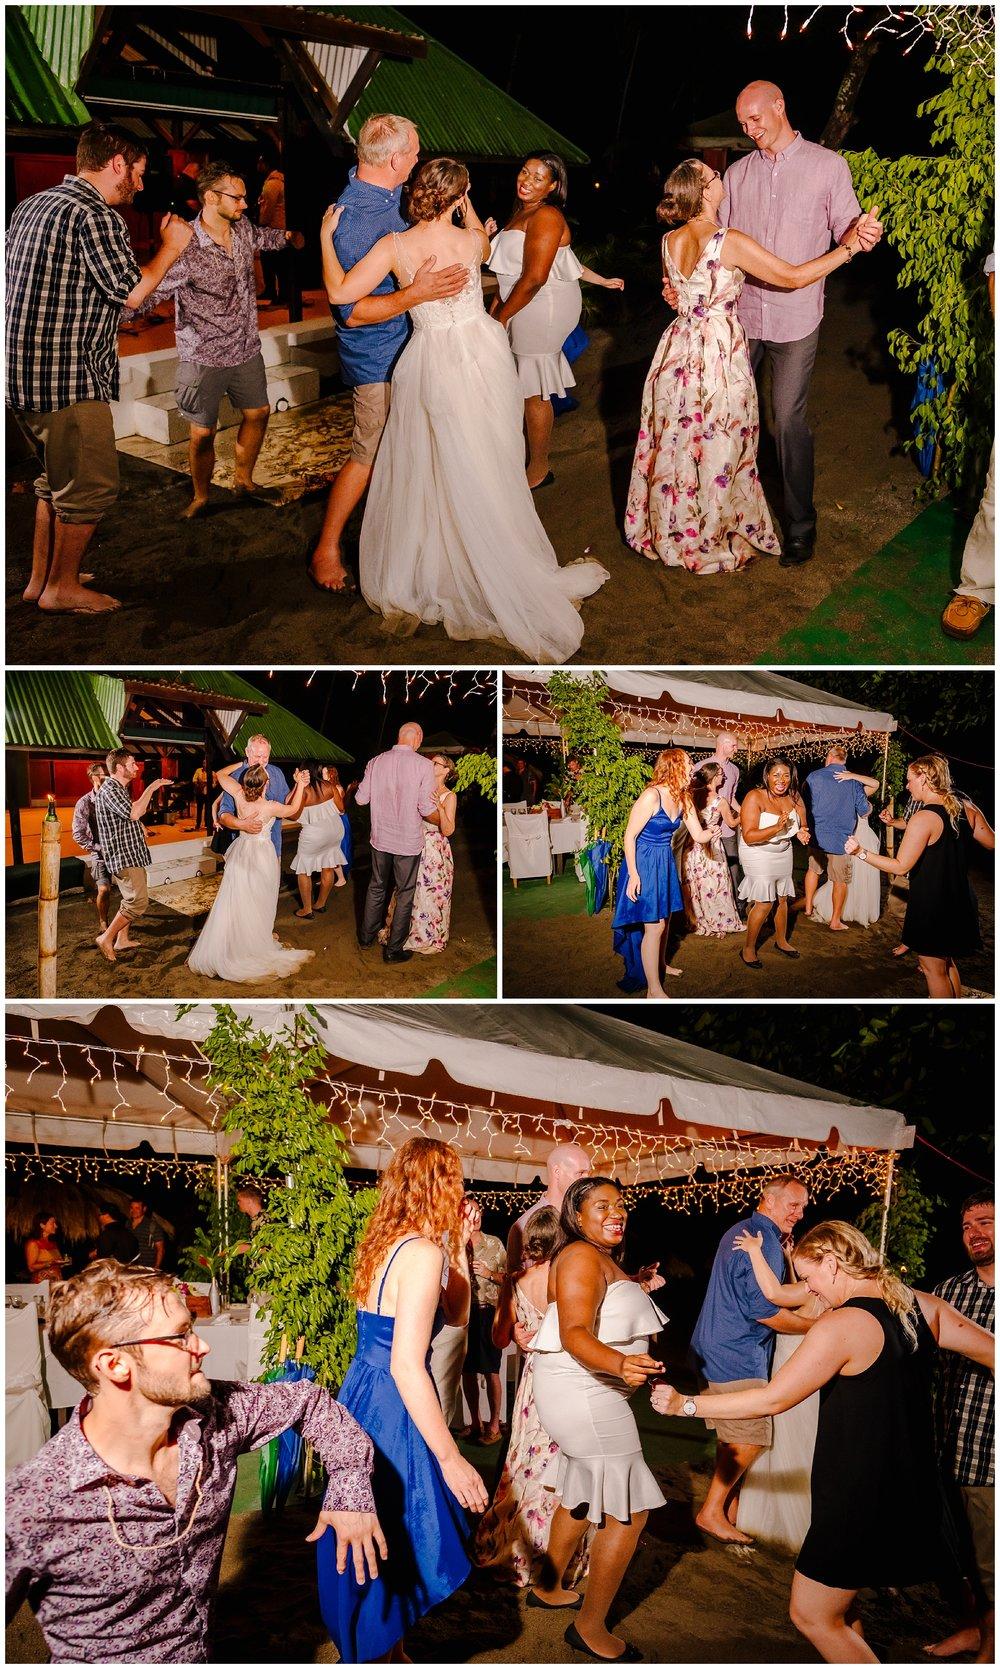 destination-wedding-photographer-st-lucia-black-sand-beaches_0105.jpg